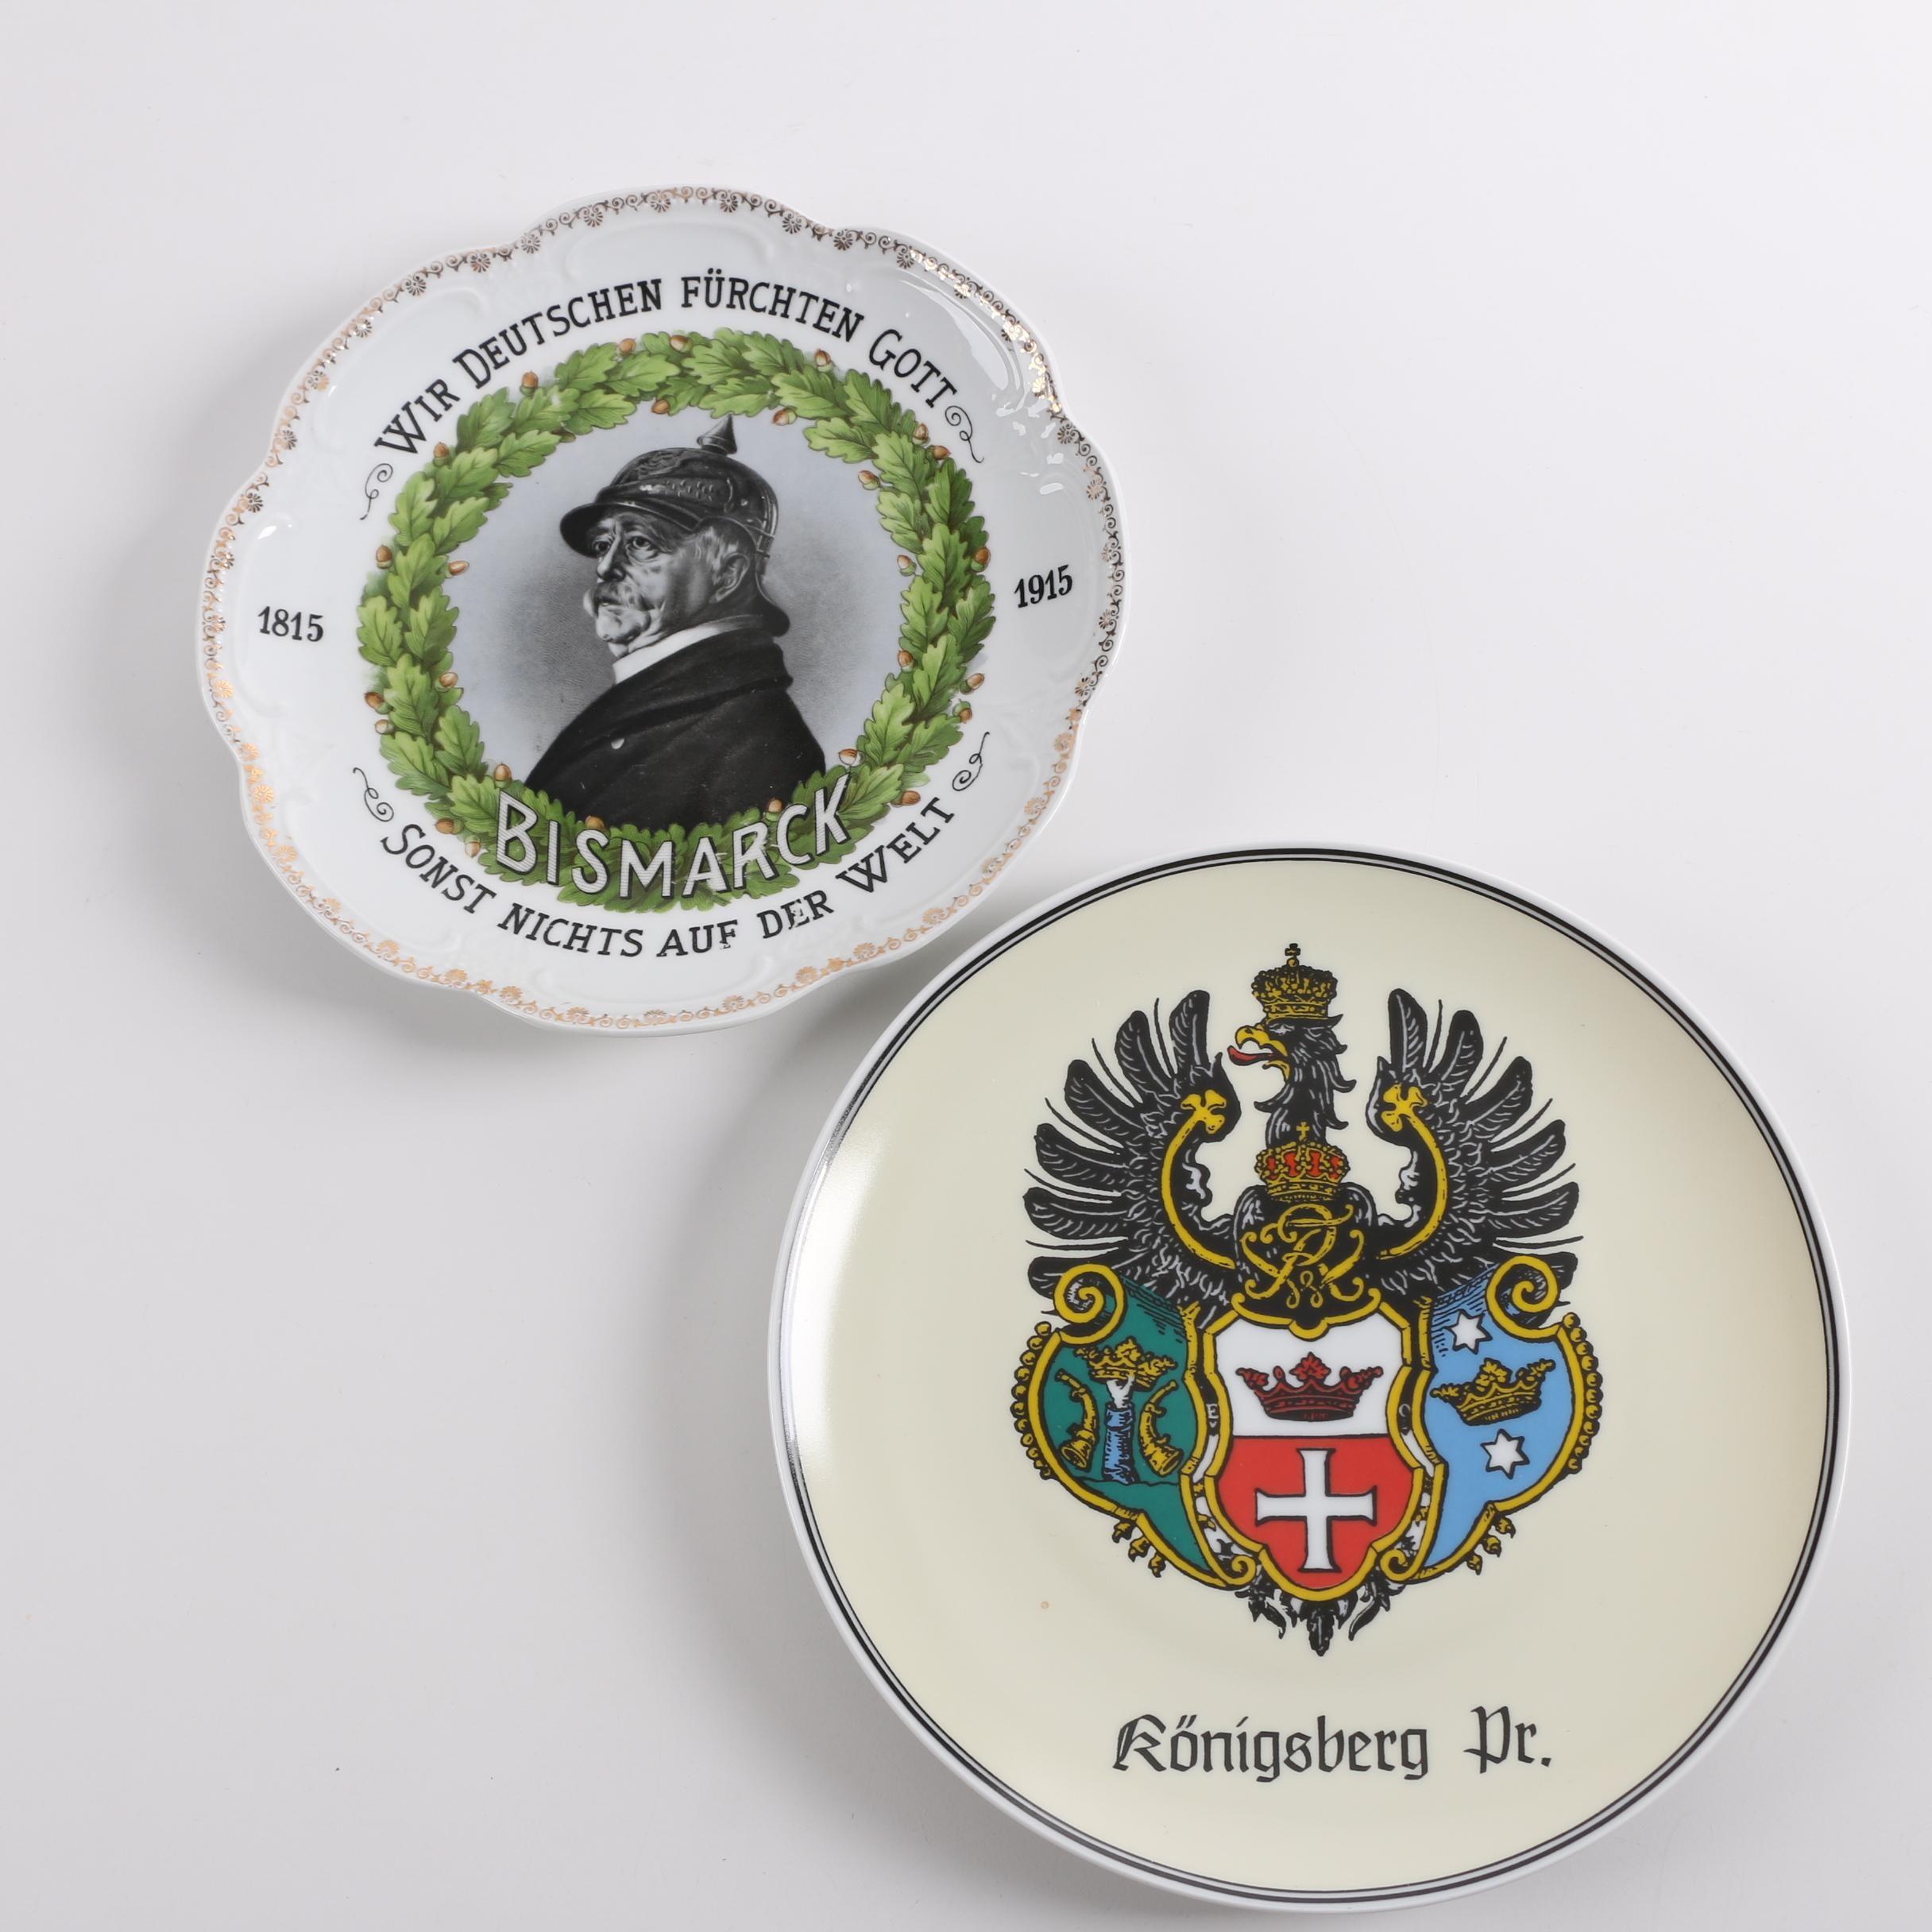 German Porcelain Plates Featuring Goebel